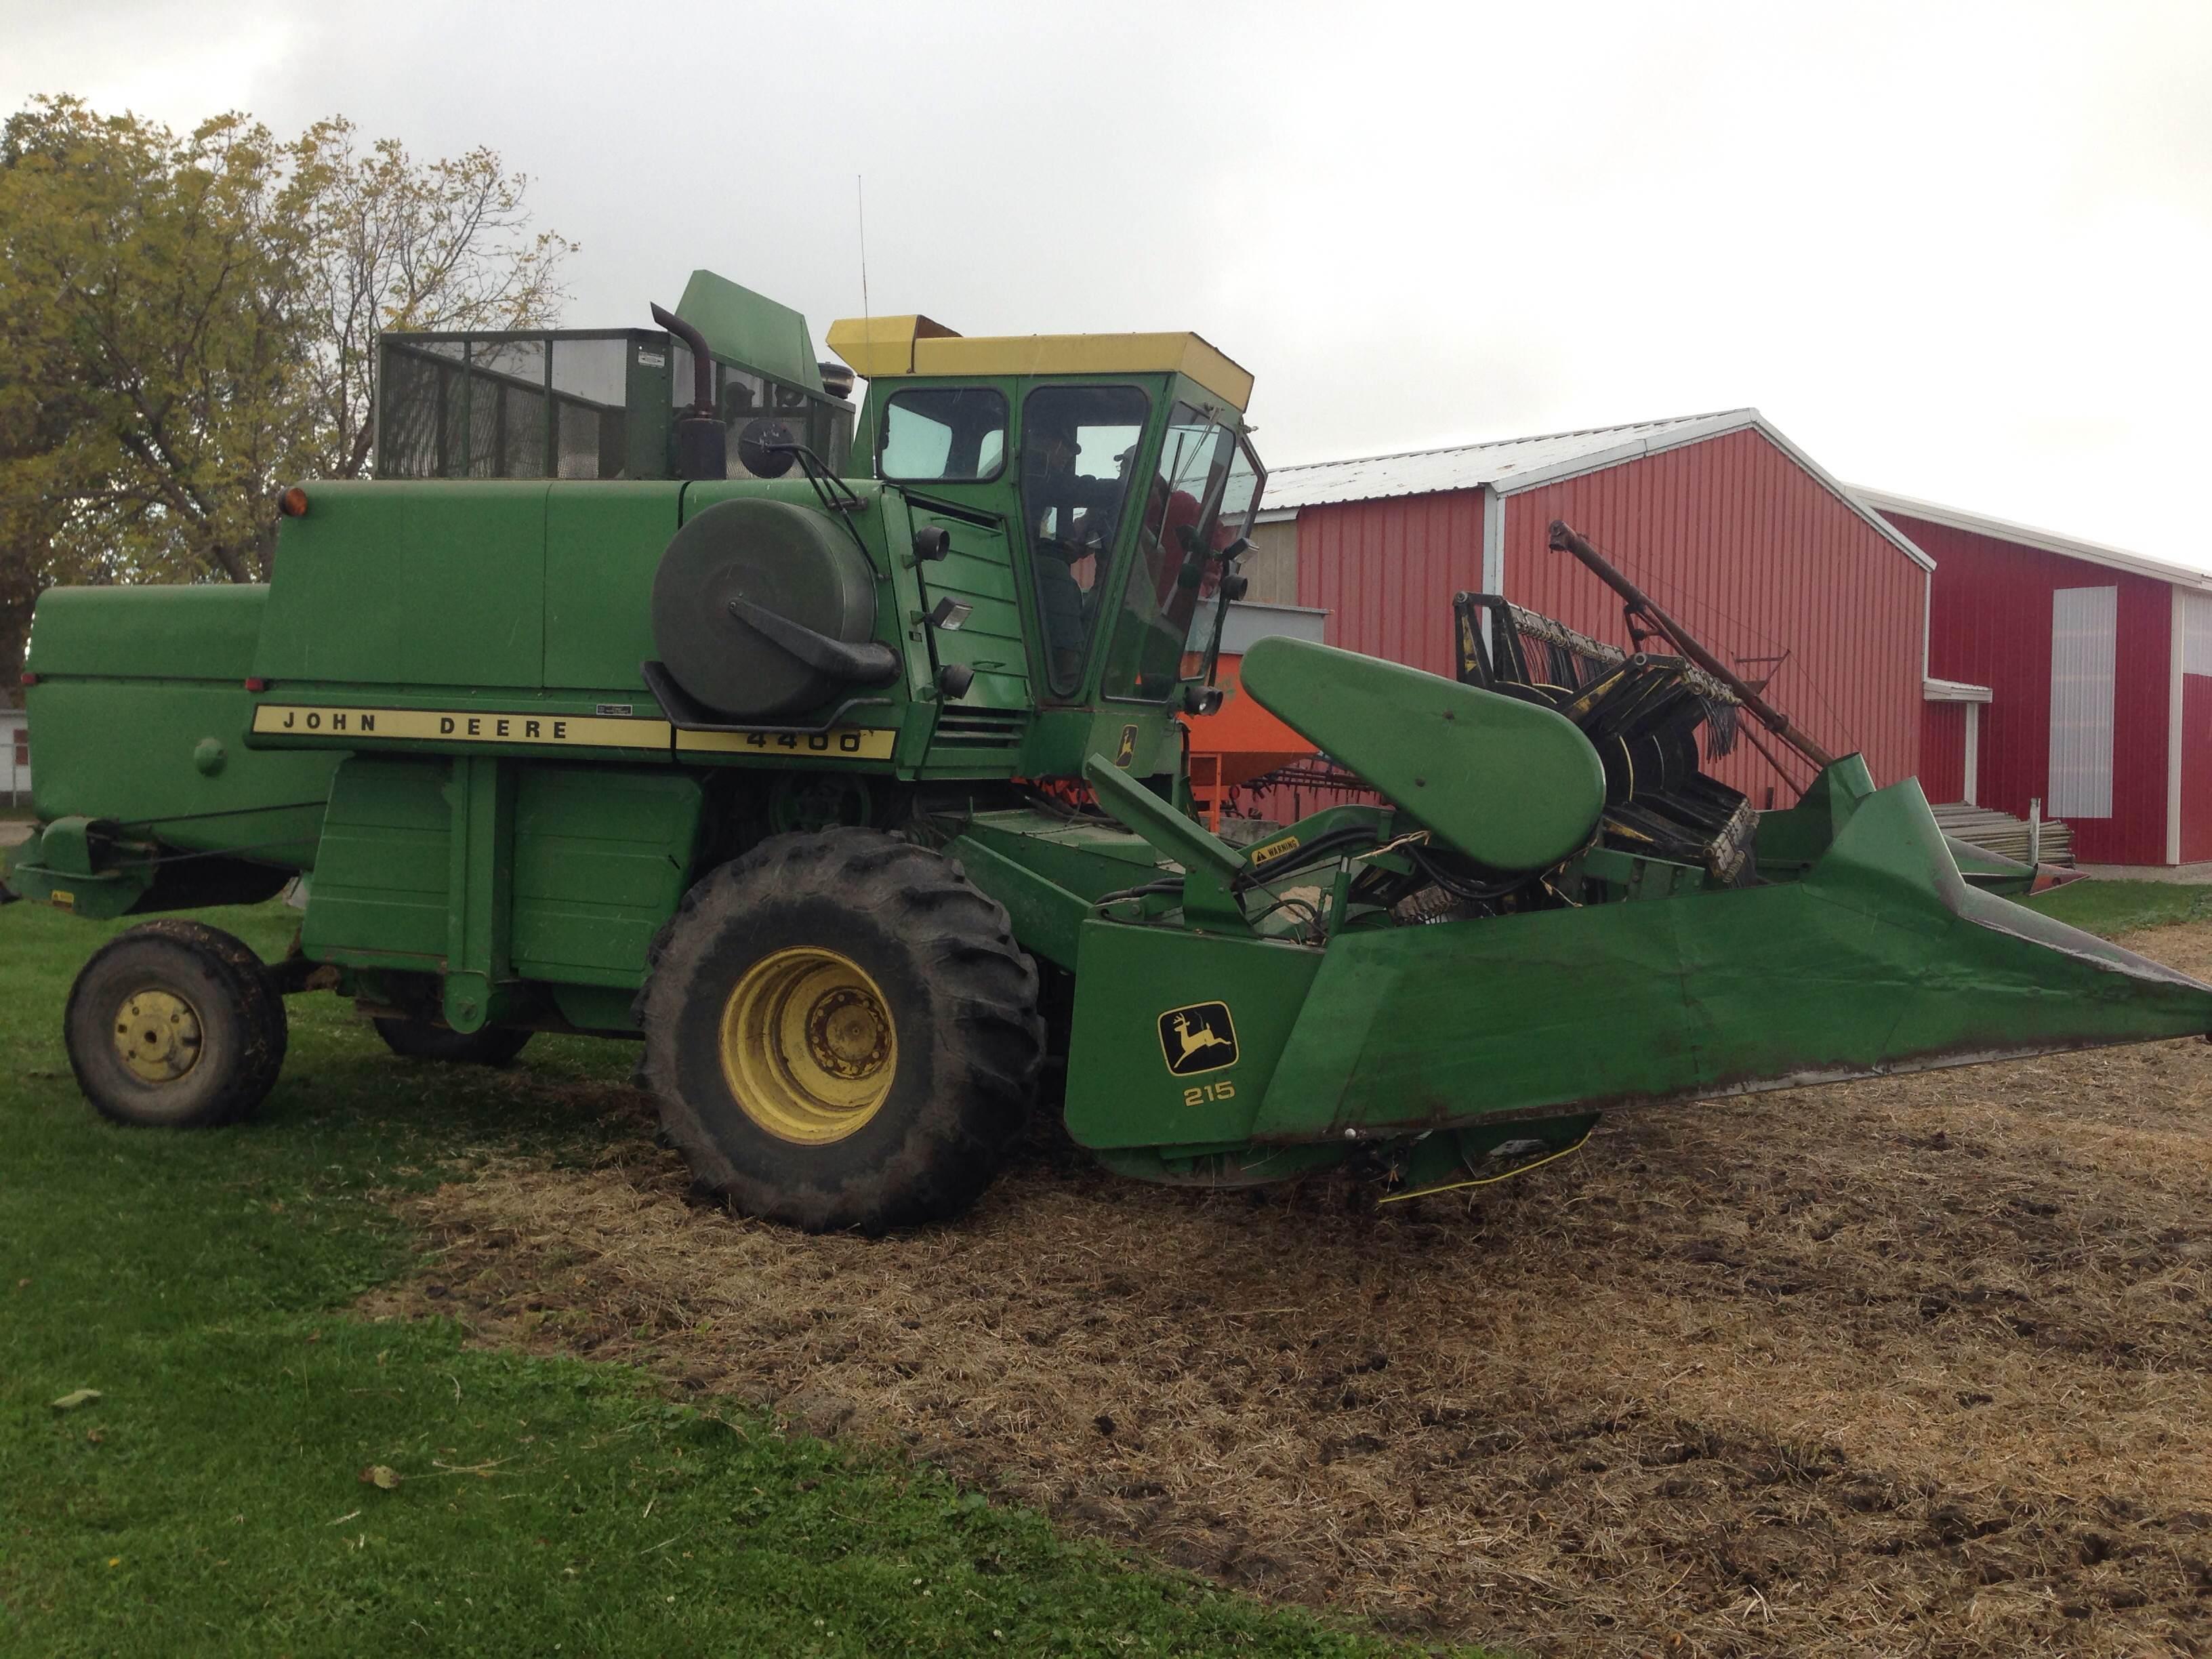 John Deere Combine >> A John Deere Combine That Is Anything But Green Ohio Ag Net